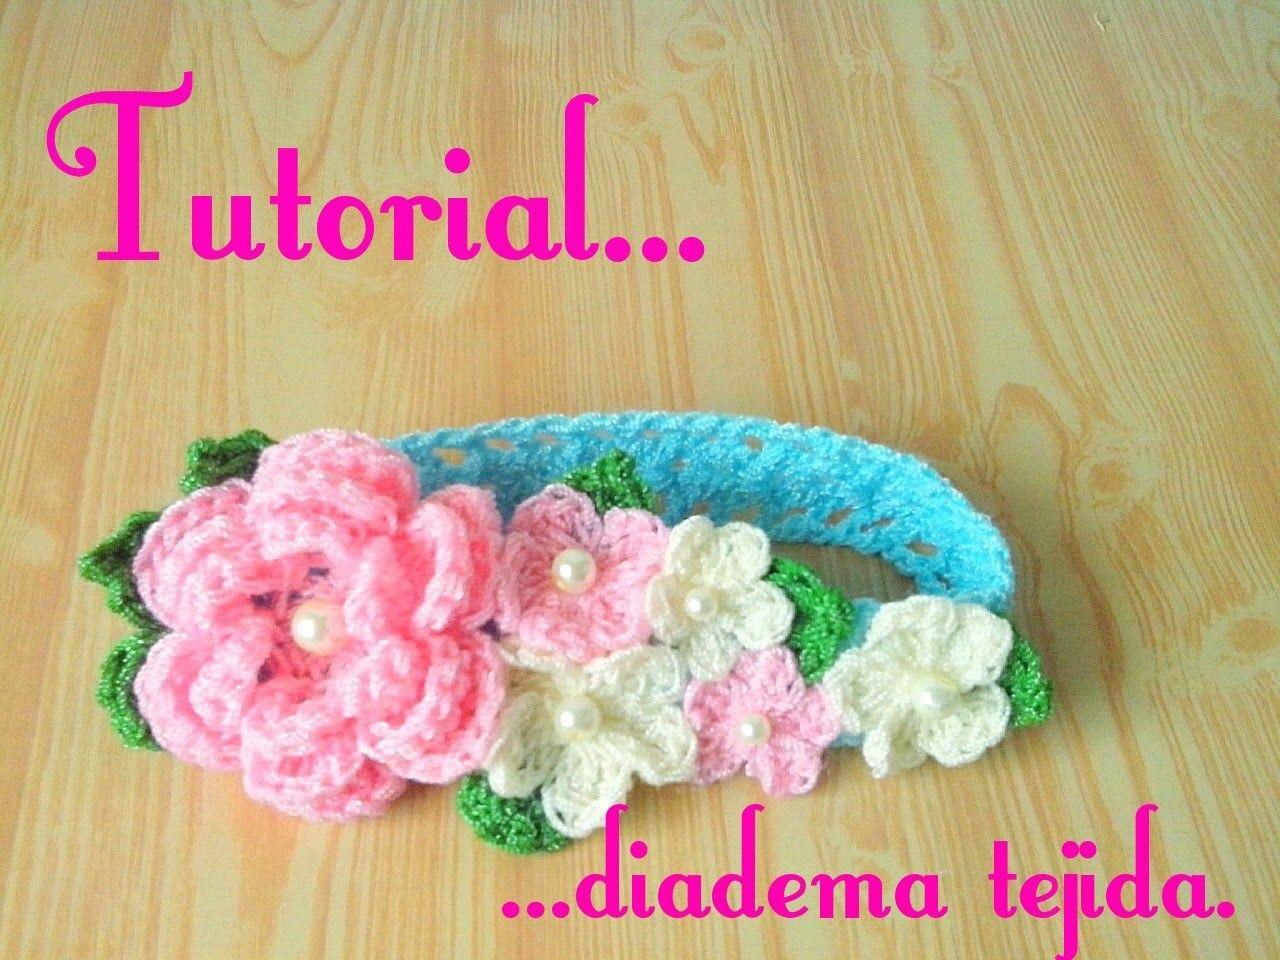 Crochet diadema tejida para bebe ganchillo diademas - Diademas de ganchillo ...